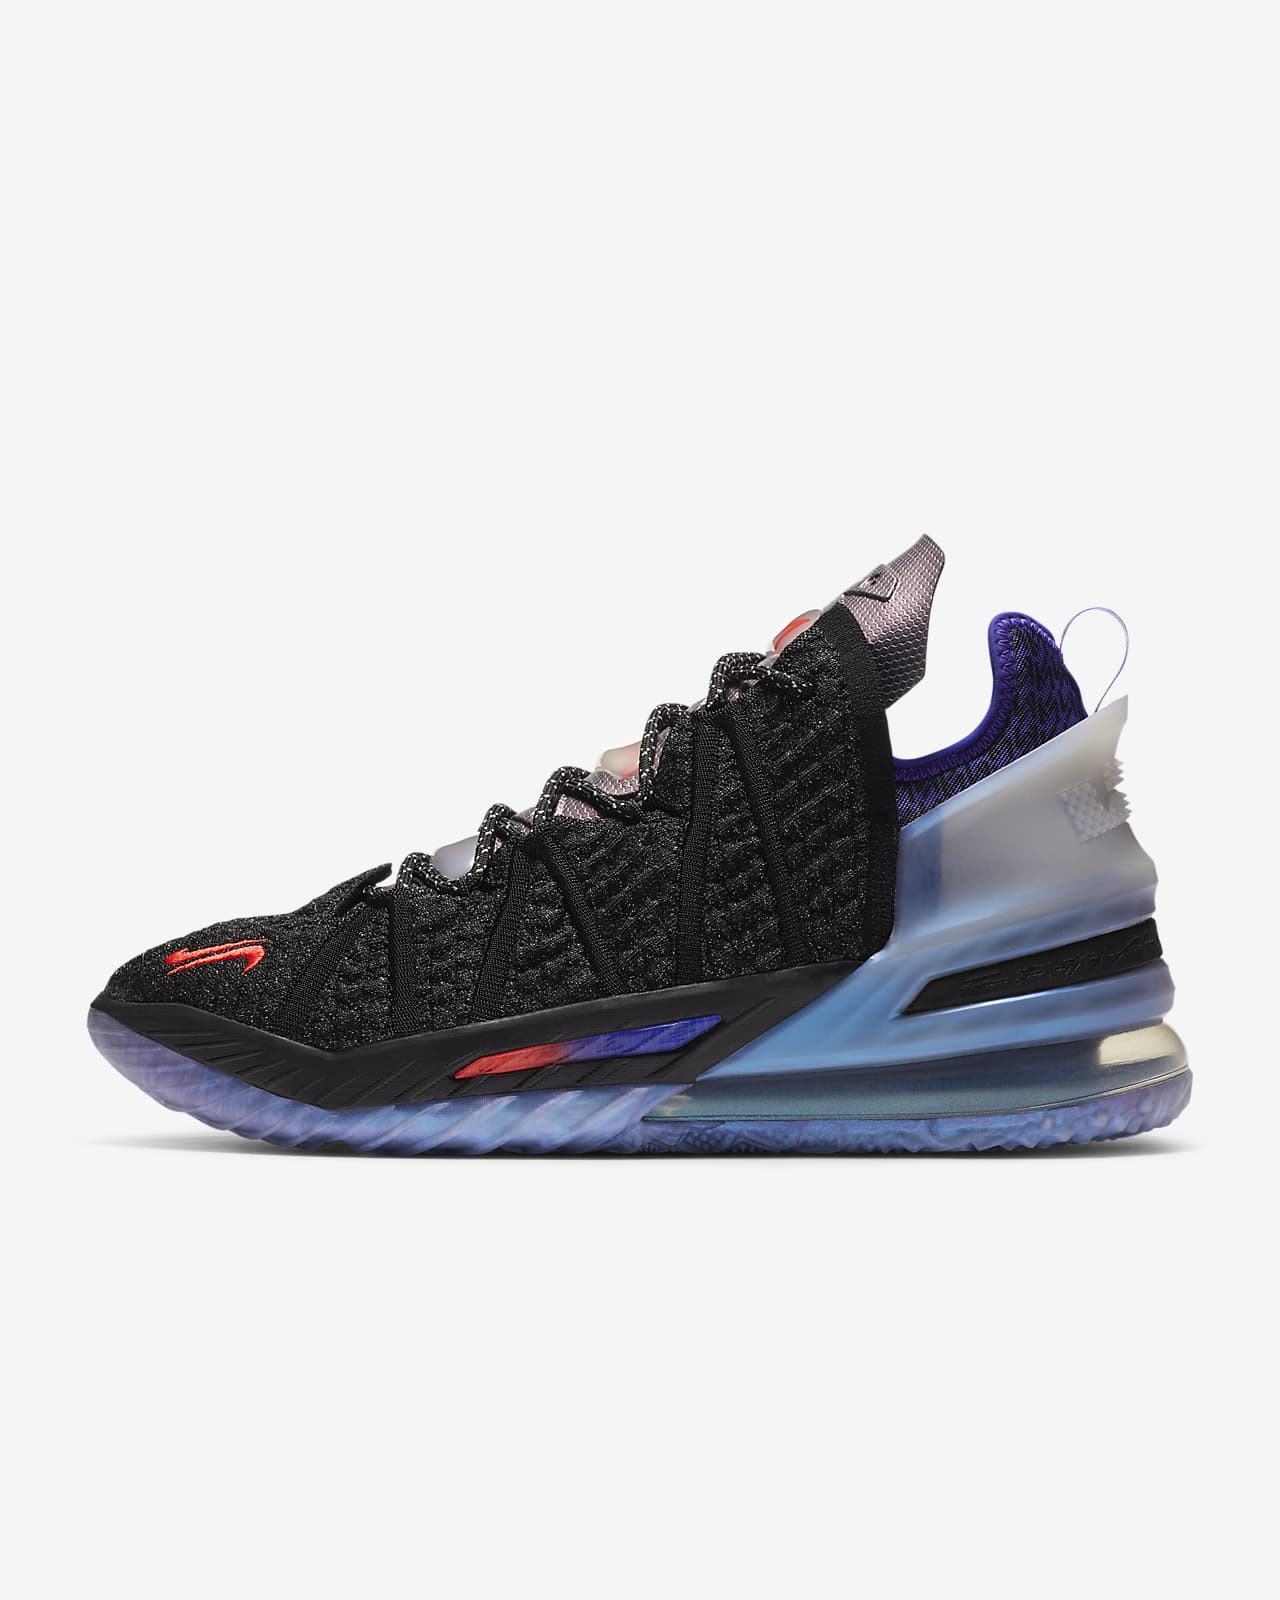 LeBron 18 'The Chosen 2' Basketball Shoe